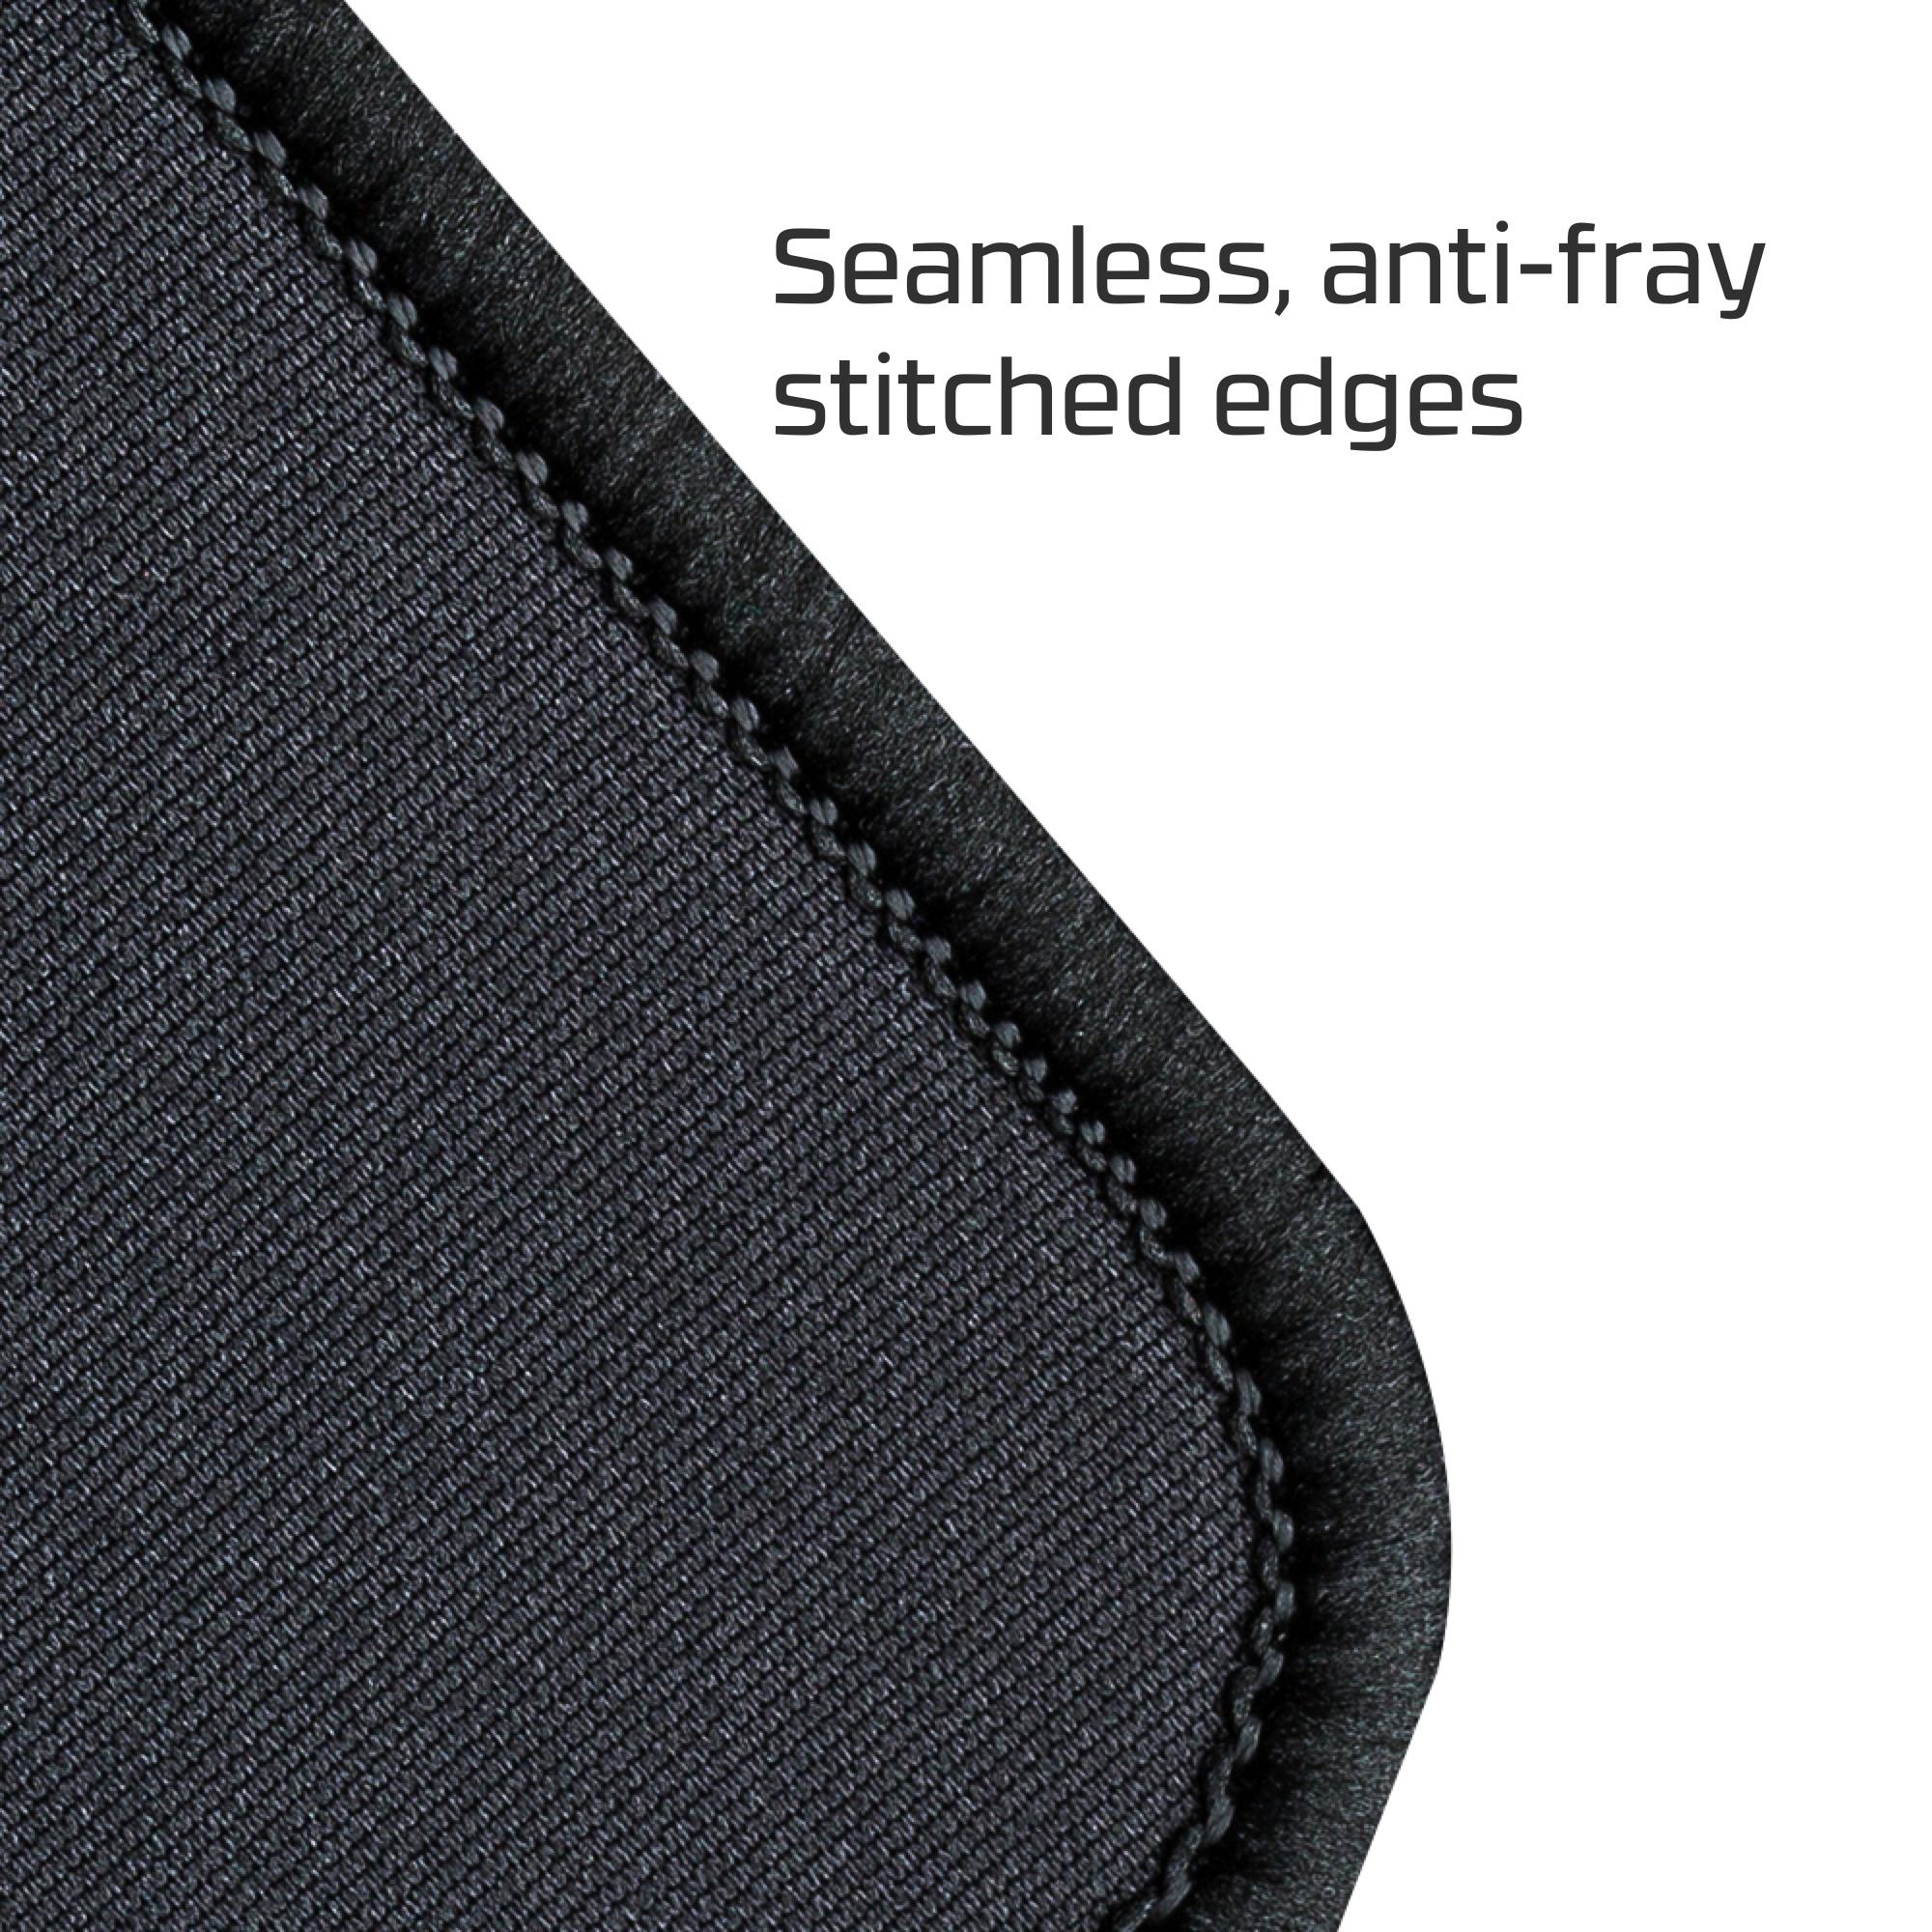 6436fb2dffe HyperX FURY S Speed Edition Pro Gaming Mouse Pad (Medium) 300mm x 360m